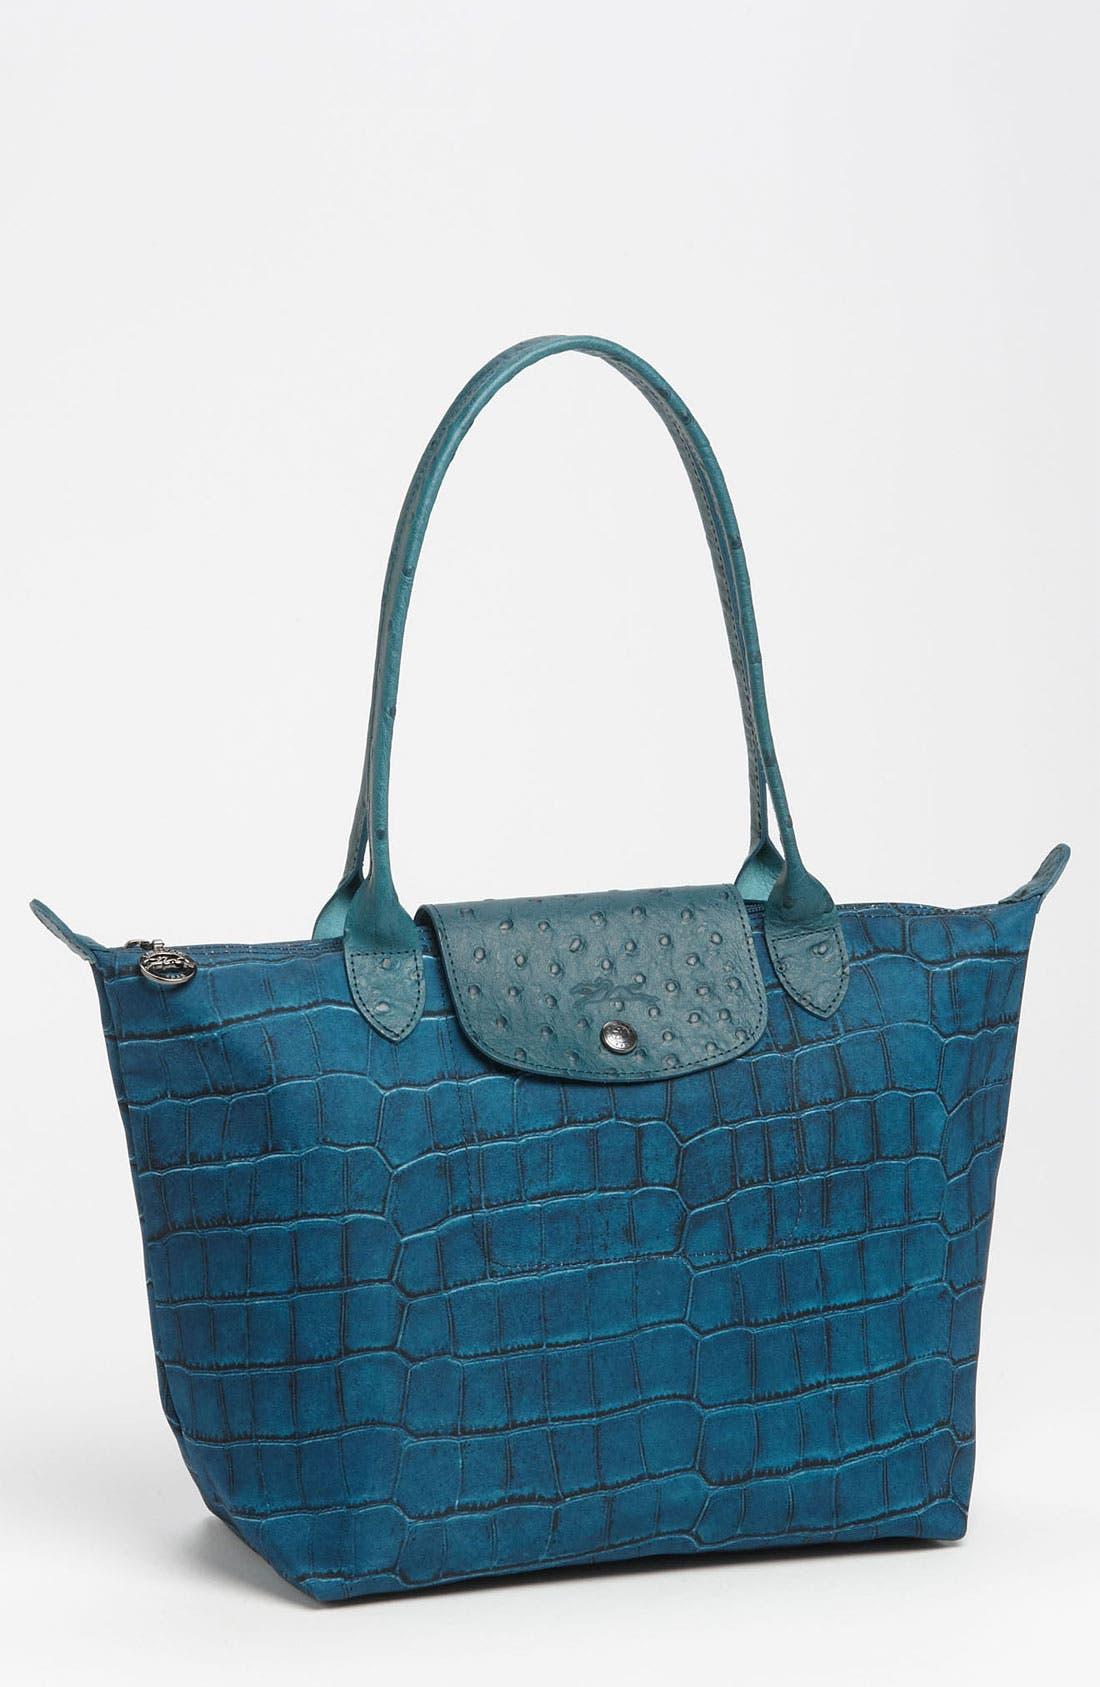 Alternate Image 1 Selected - Longchamp 'Le Pliage Croco' Small Shoulder Tote